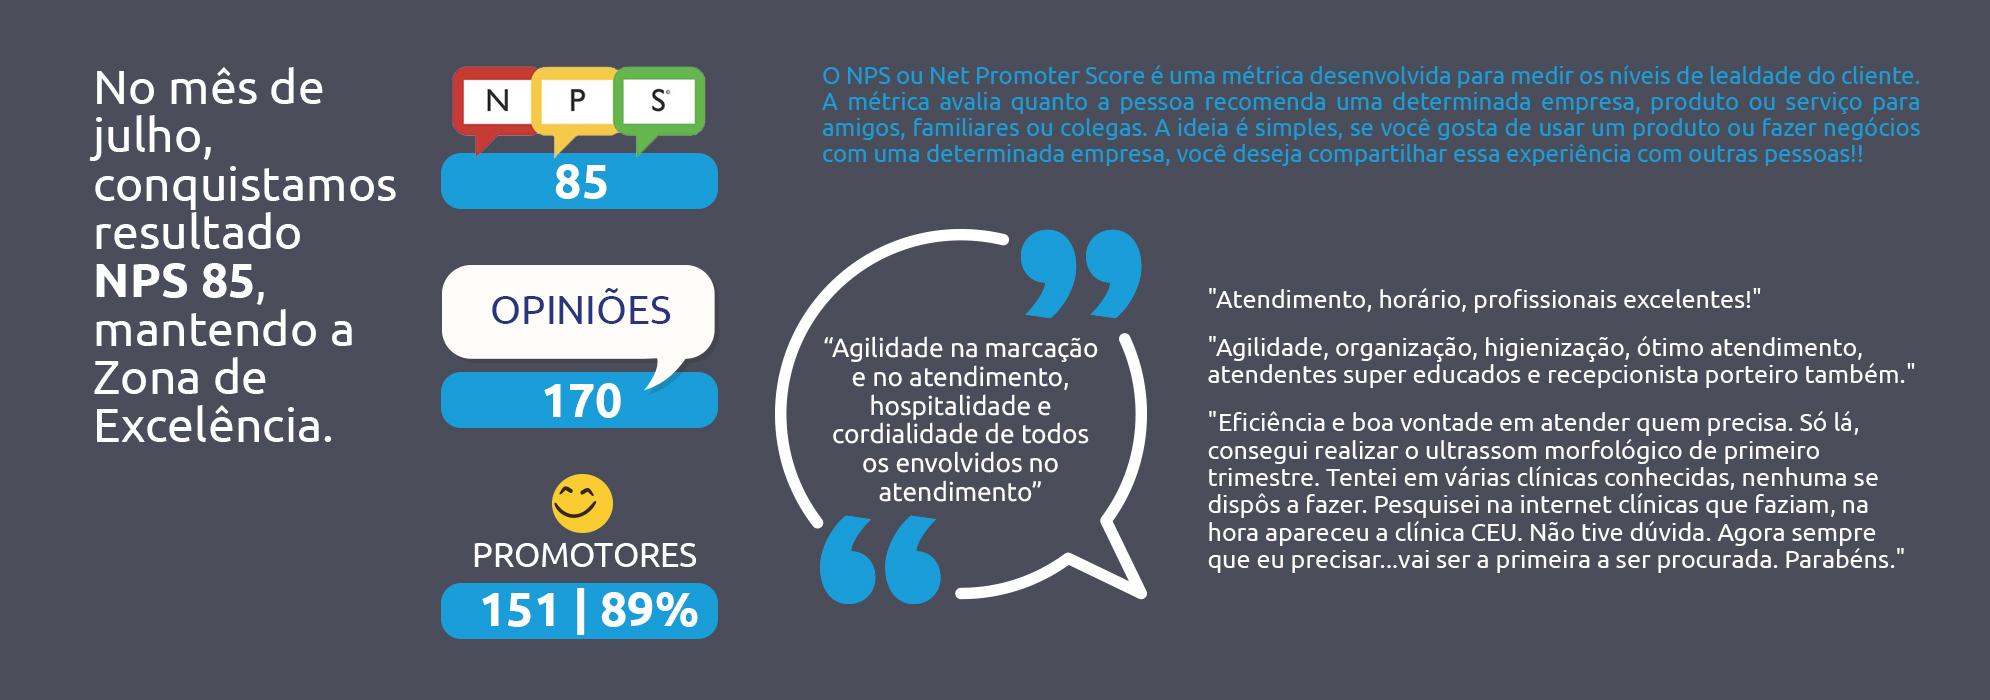 NPS-de-maio-Clinica-CEU